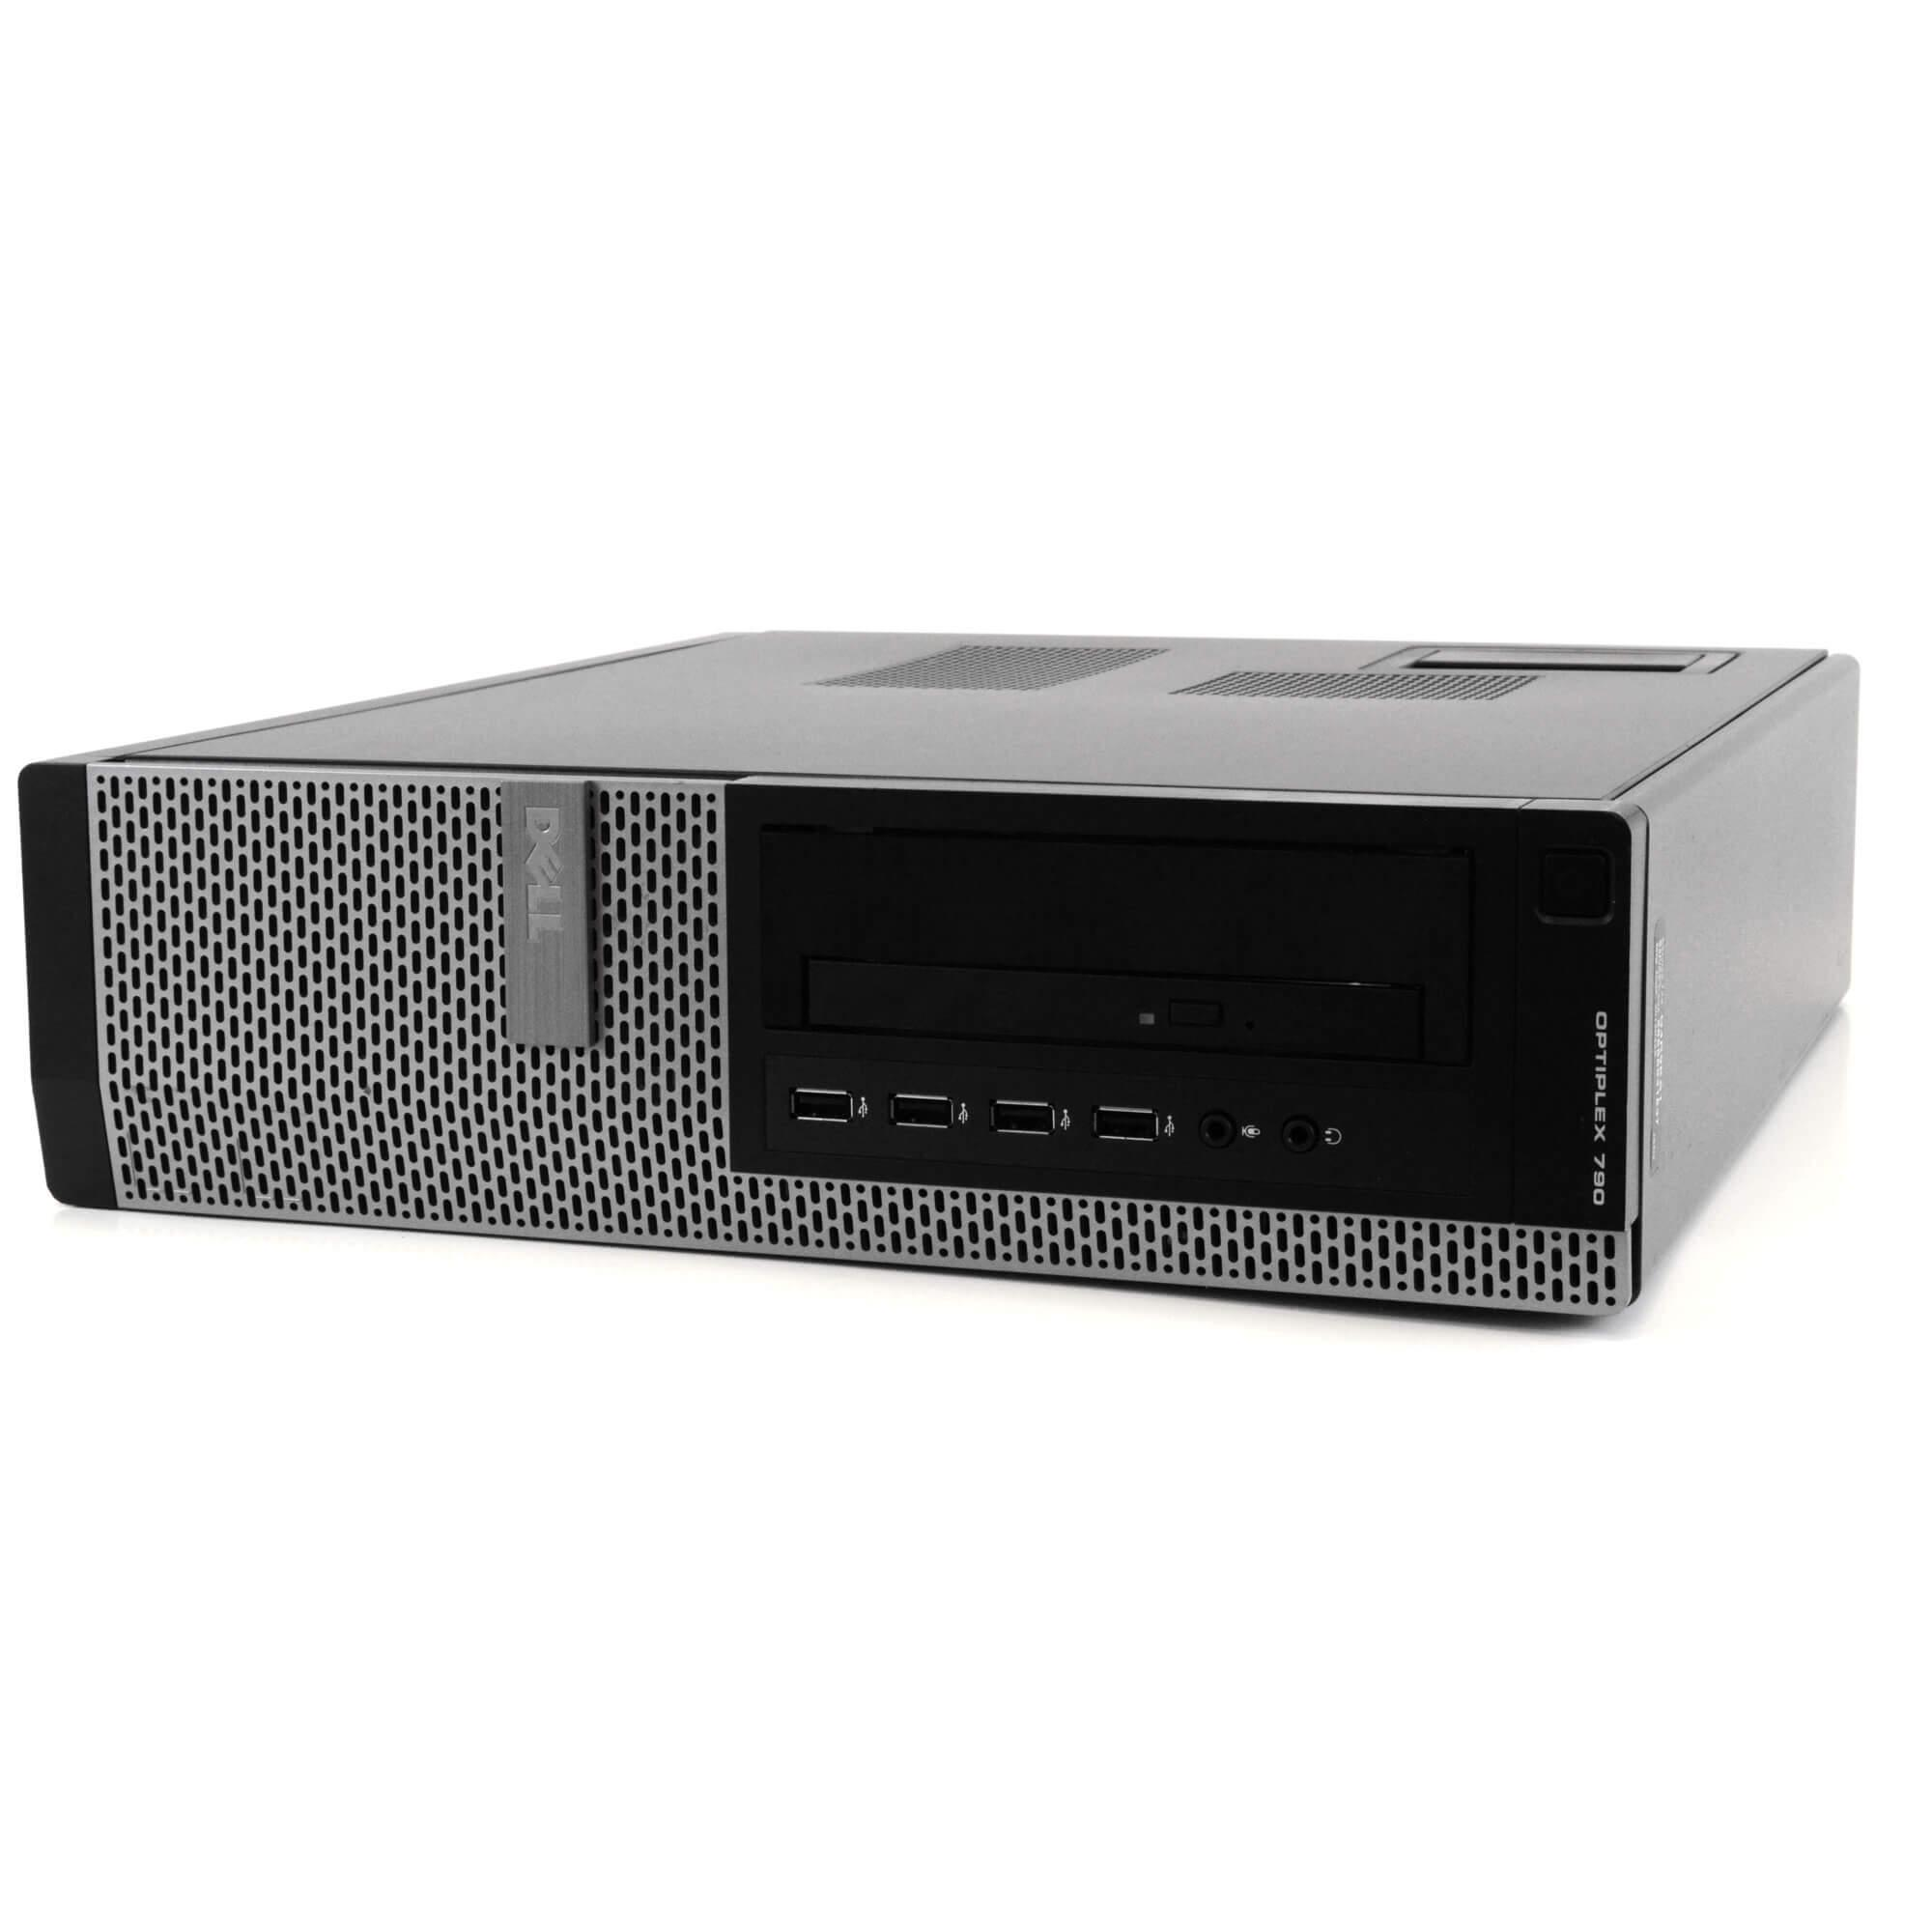 Dell OptiPlex 790 Core i5 3.2 GHz - HDD 500 GB RAM 4GB